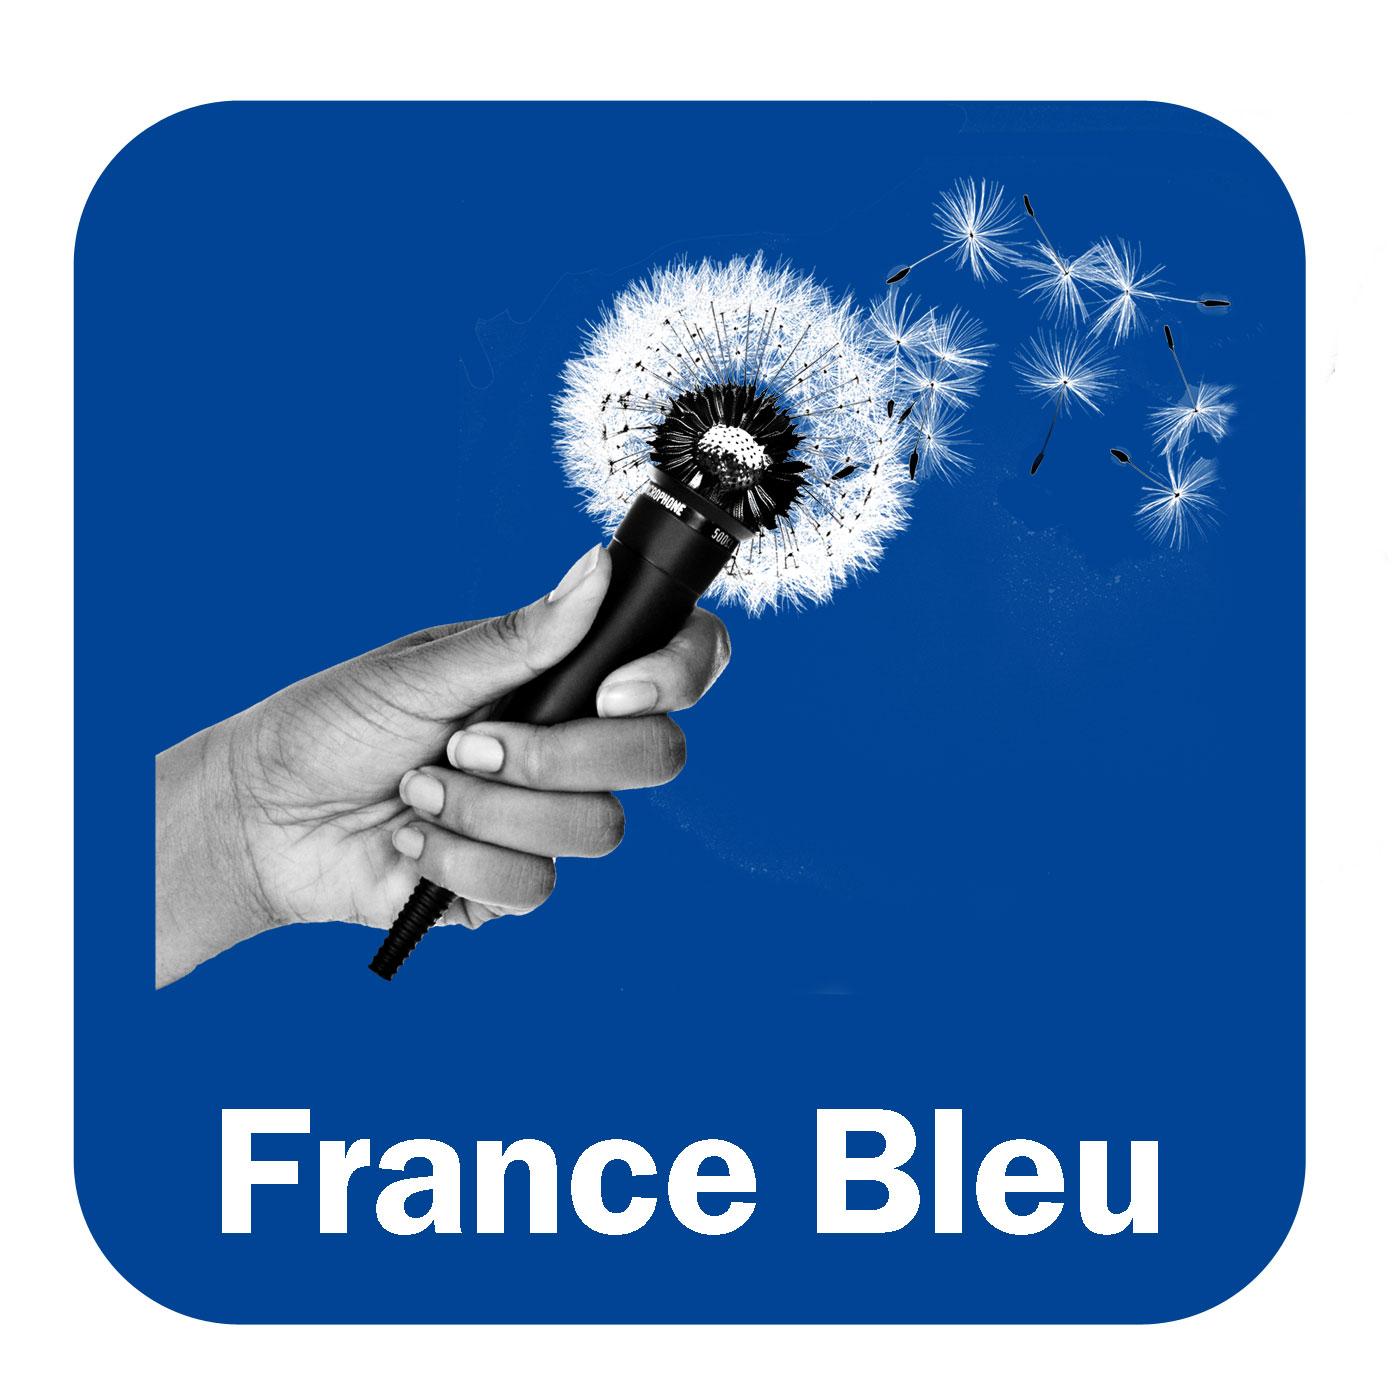 Les experts jardin France Bleu Azur